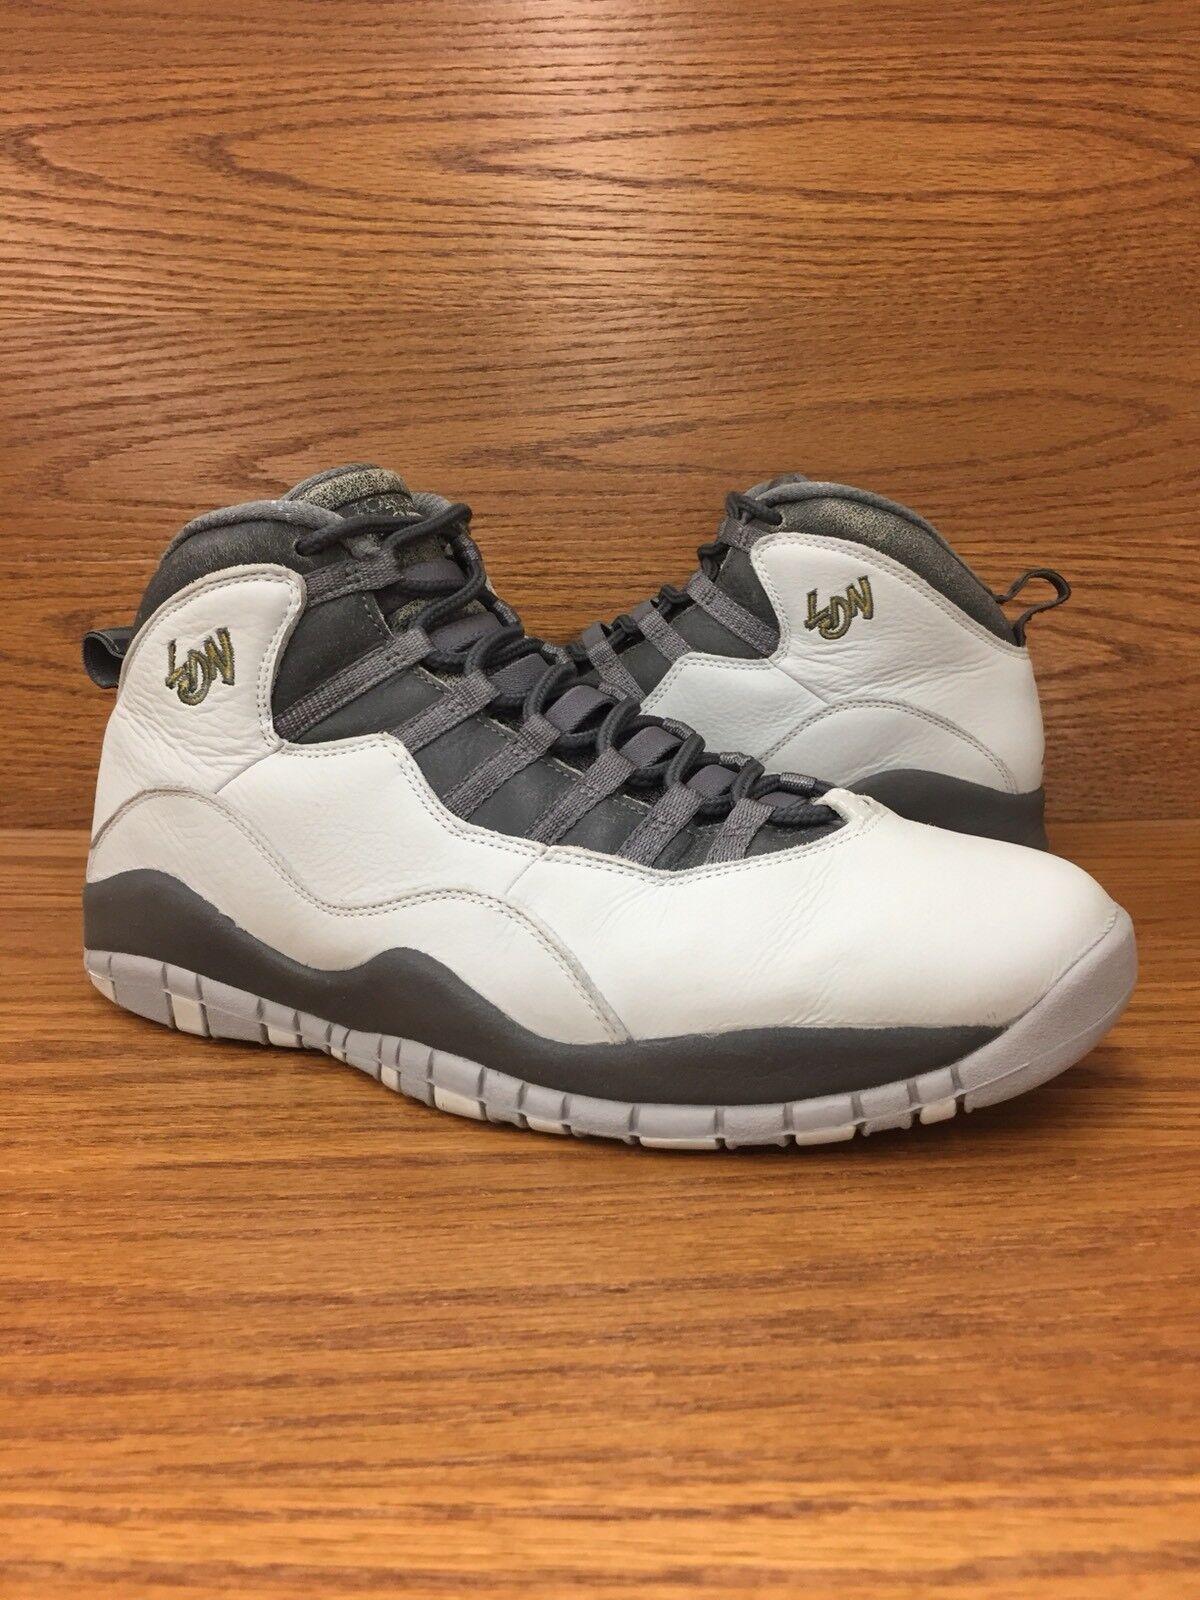 Air Jordan 10 Retro City Pack London 2018 Grey Mens Basketball Shoes Size 11